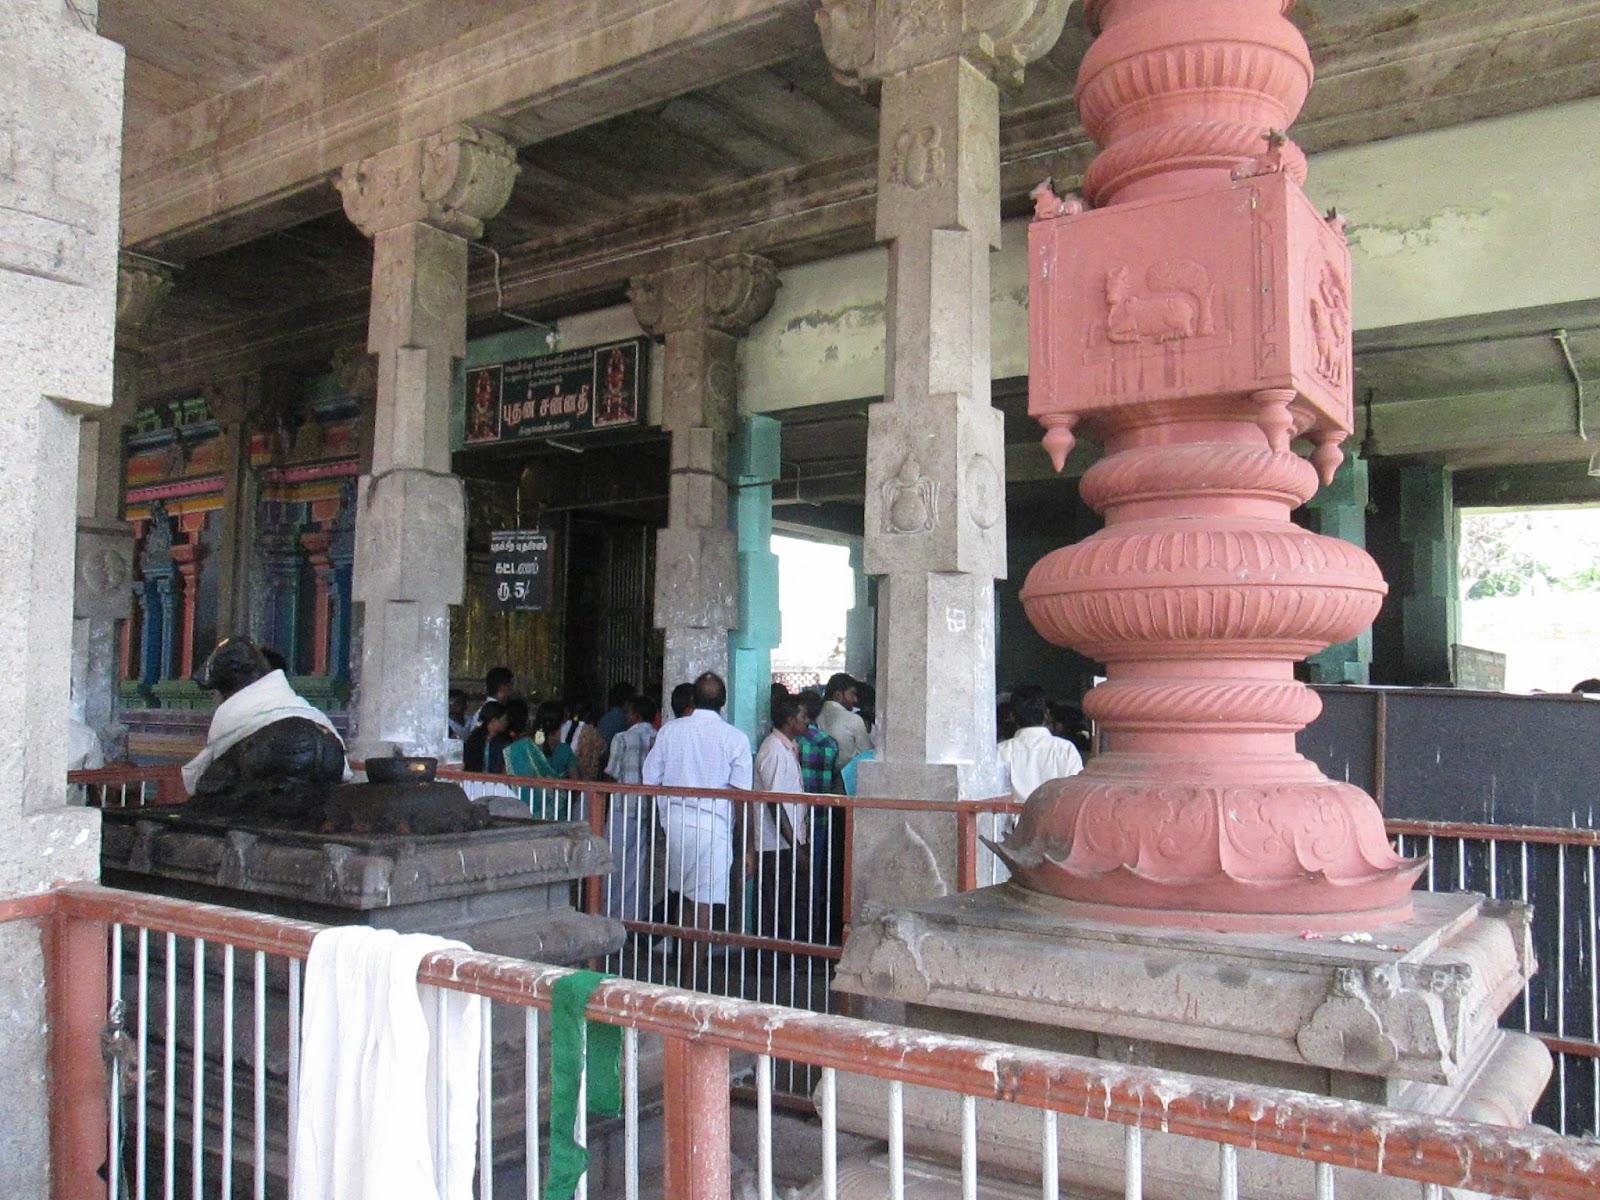 Sri Swadharanyeswarar Temple, Thiruvenkadu, Sirkazhi - 275 Shiva Temples